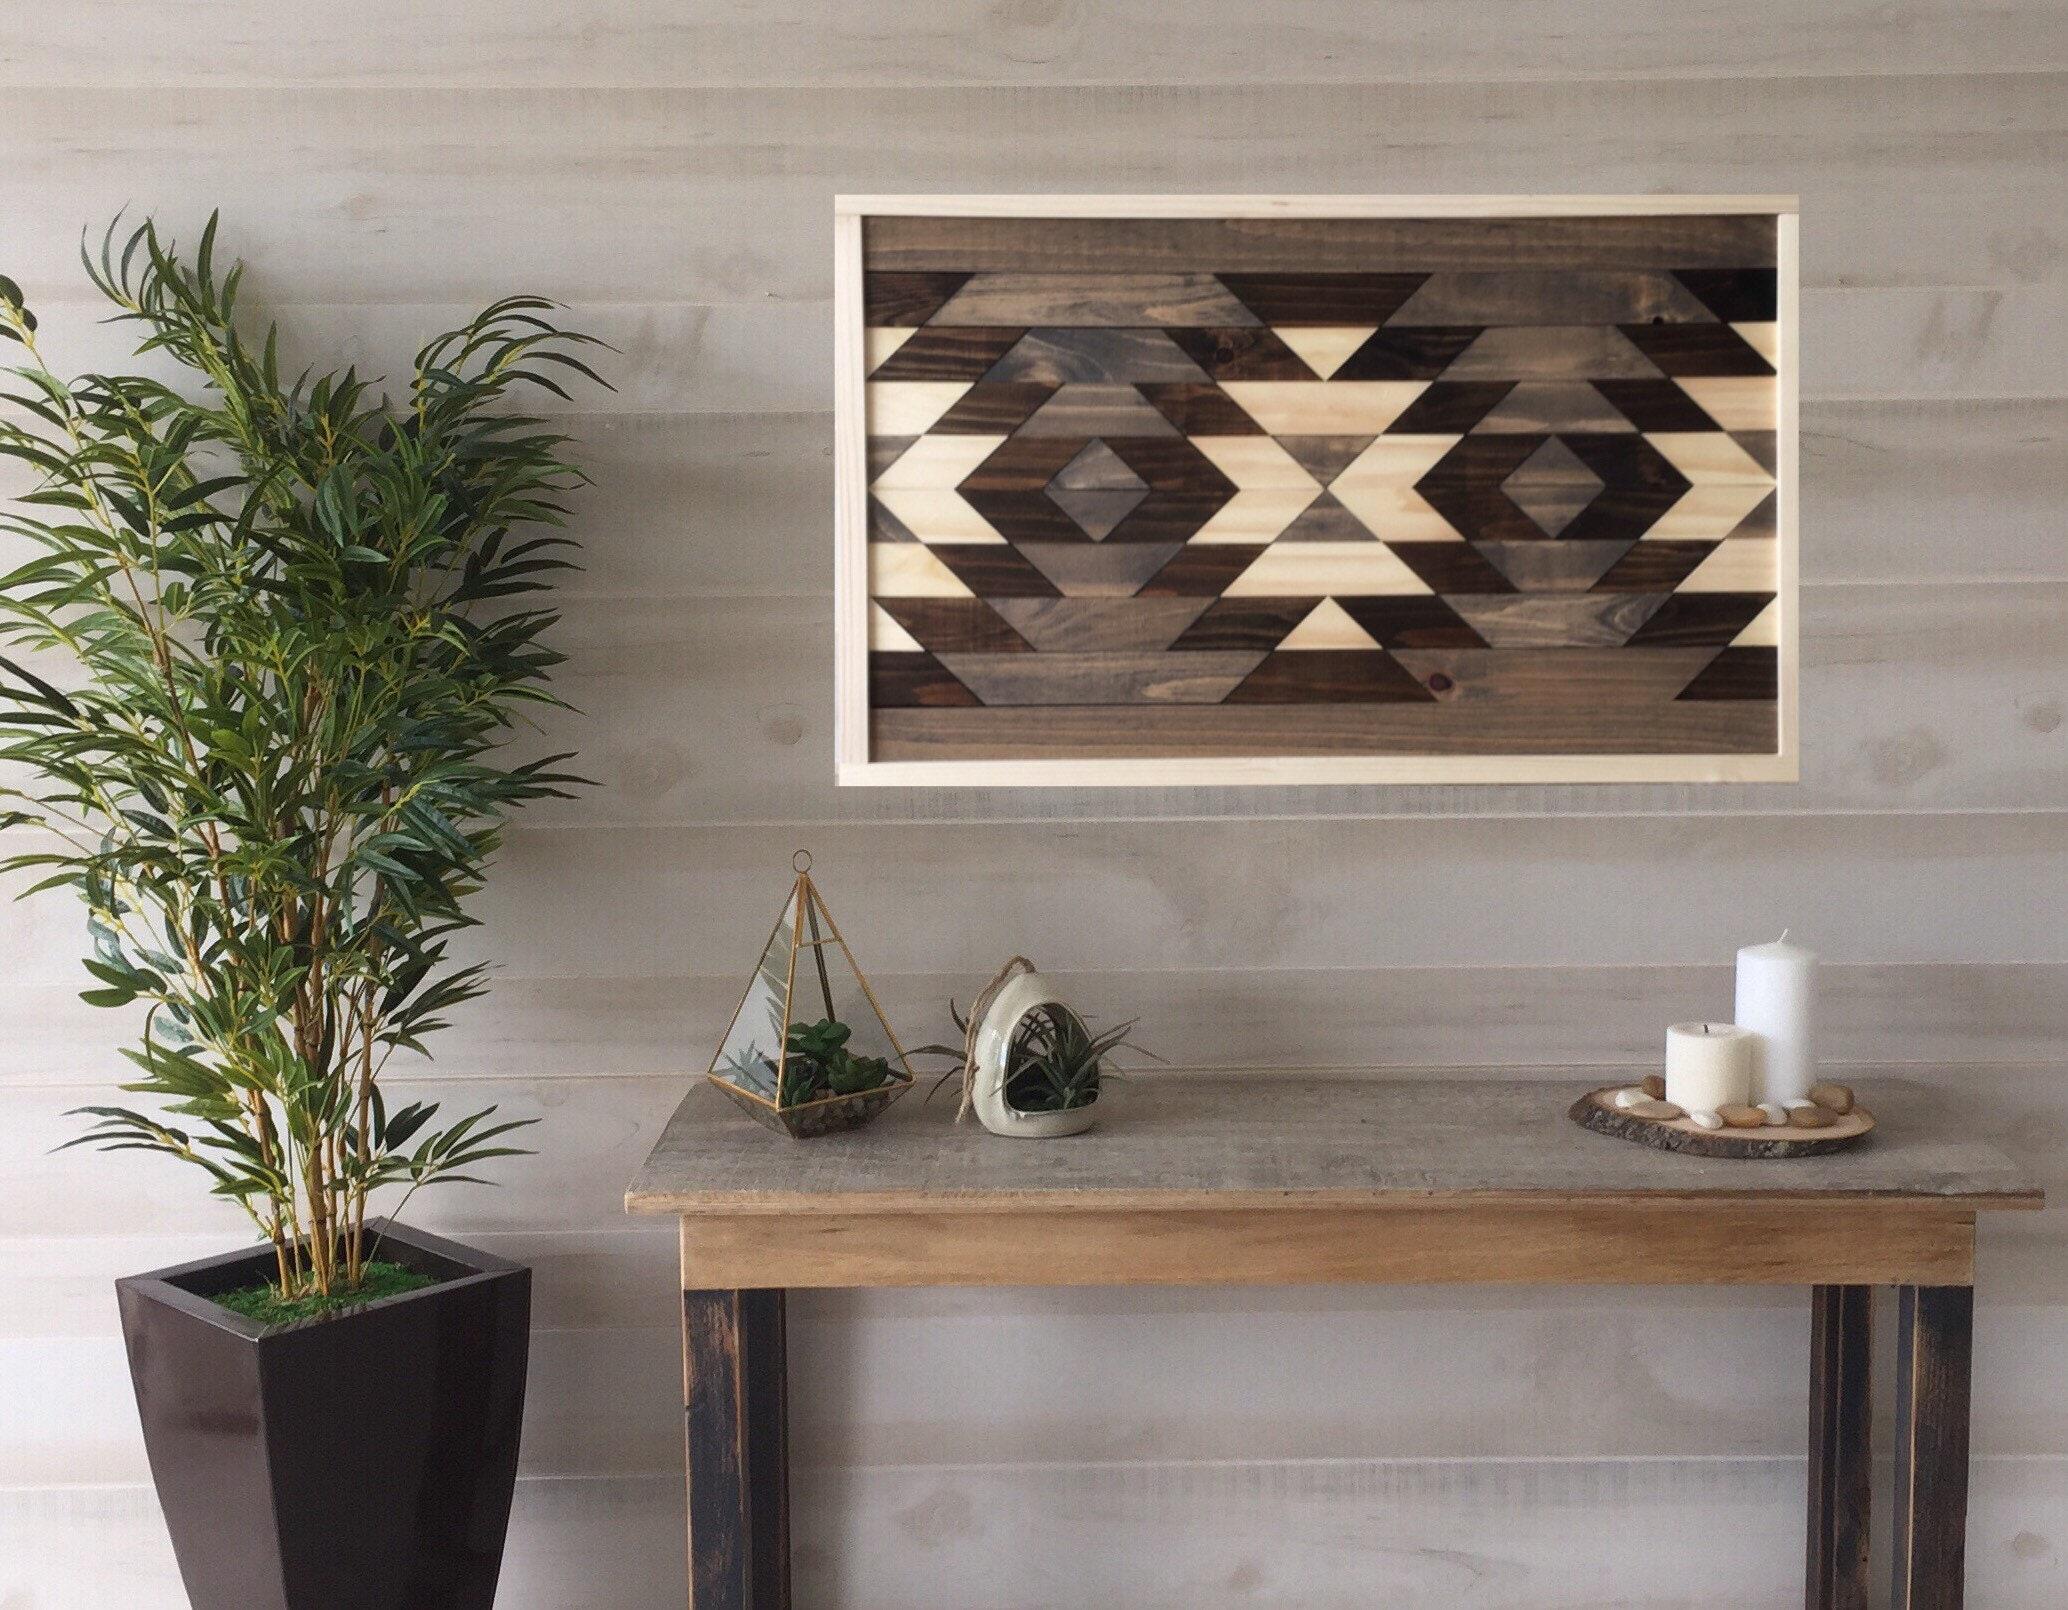 Wood Wall Art Geometric Art Boho Decor Aztec Decor Farmhouse